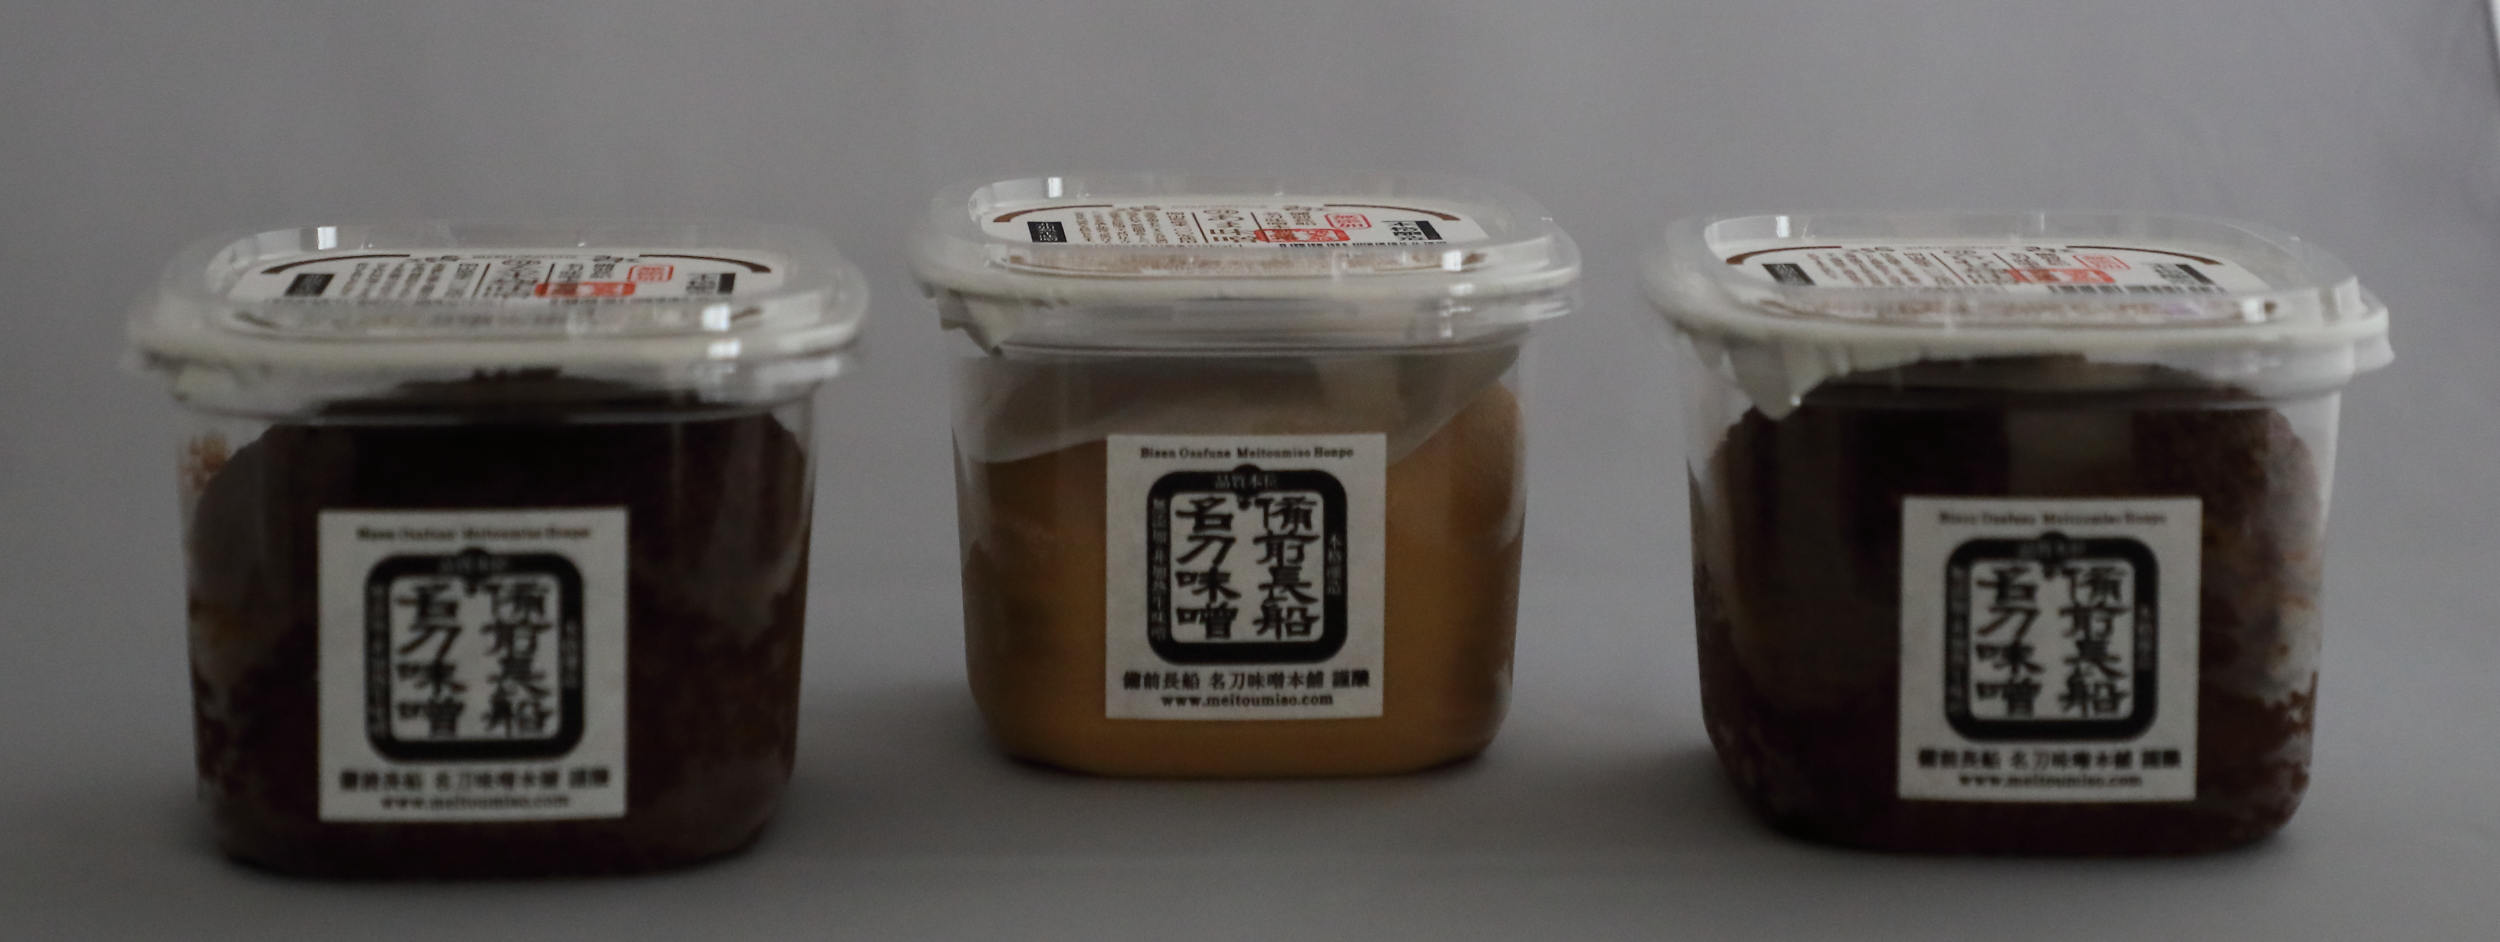 Meitou's Genmai, Ama & Awase-Koji Miso